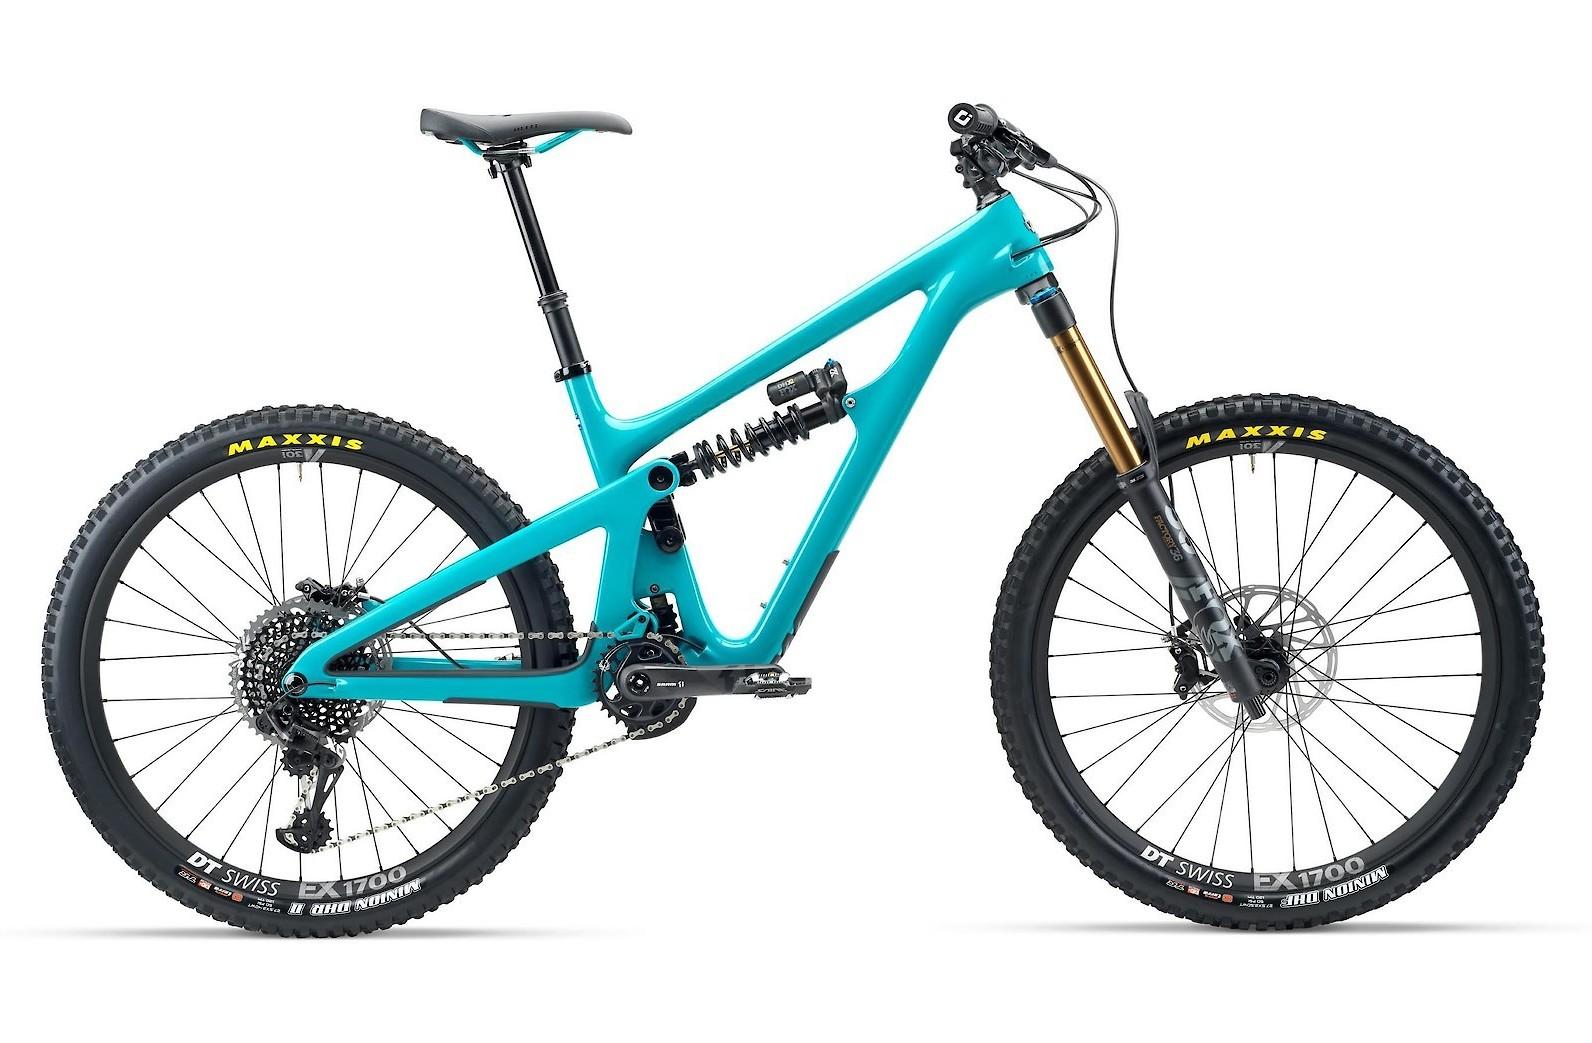 2020 Yeti SB165 Turquoise - T2 Version Shown